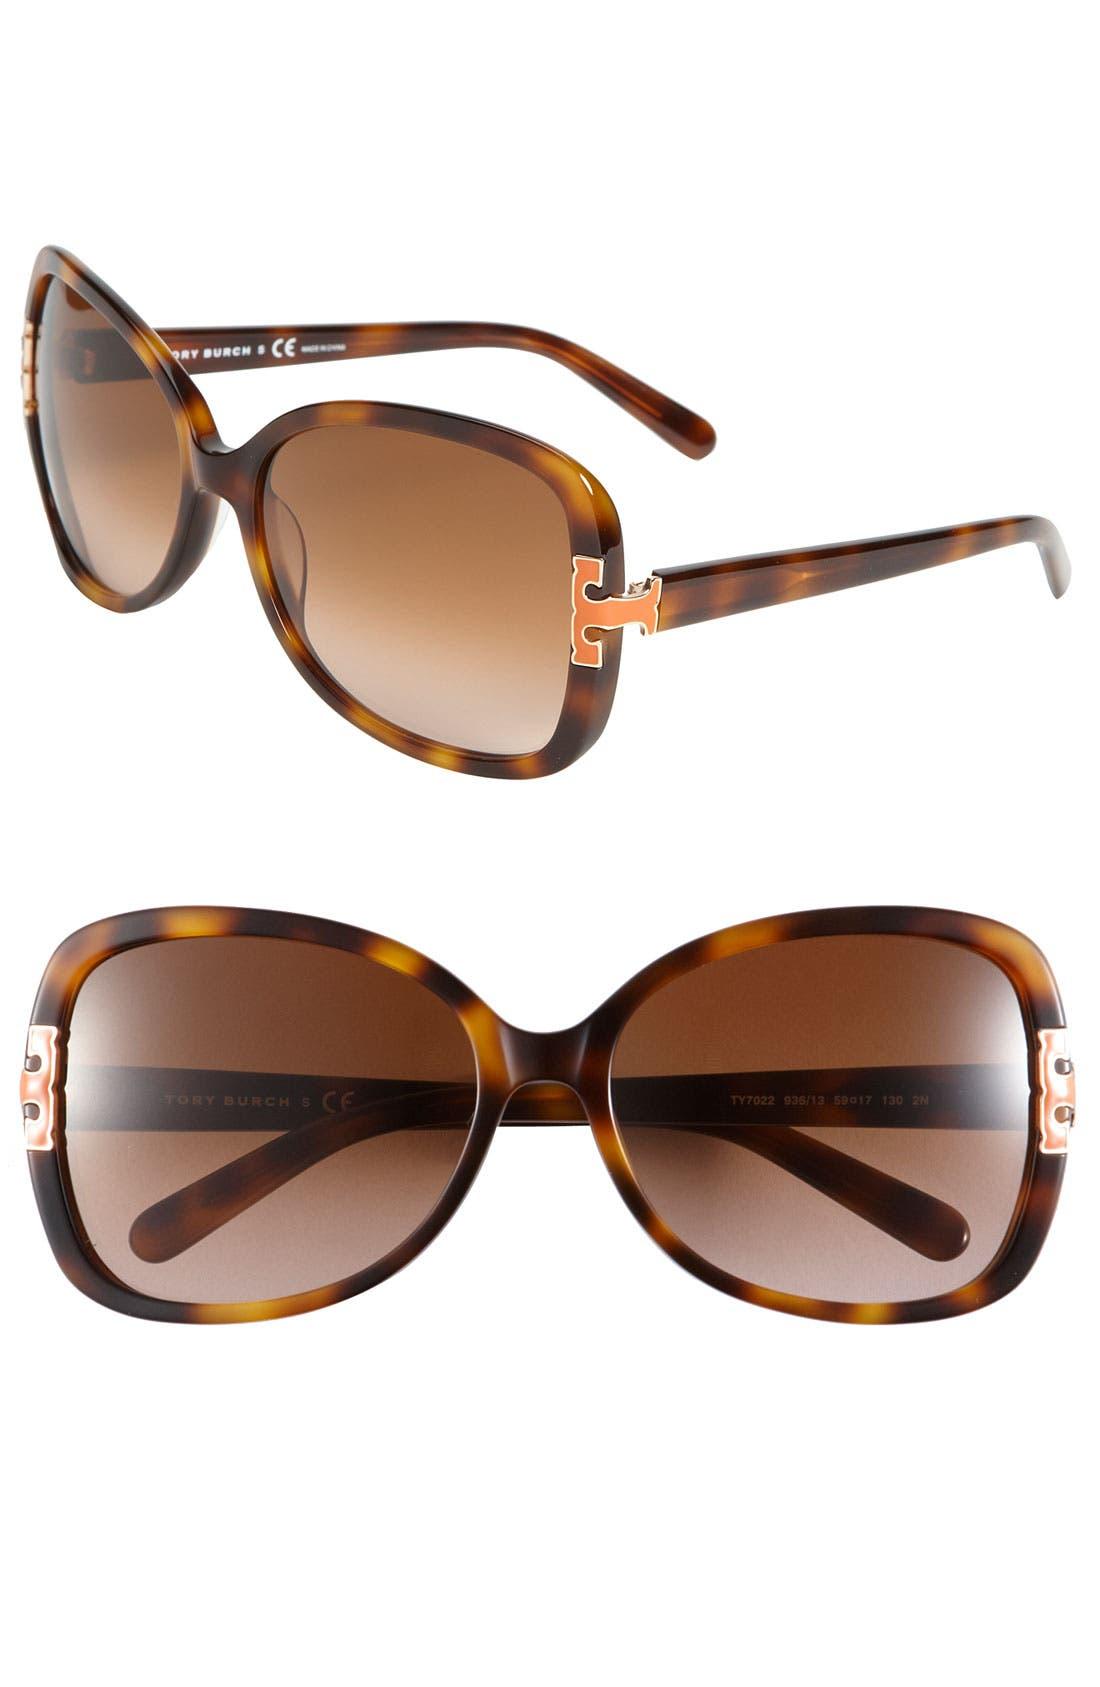 59mm Oversized Sunglasses,                             Main thumbnail 1, color,                             200